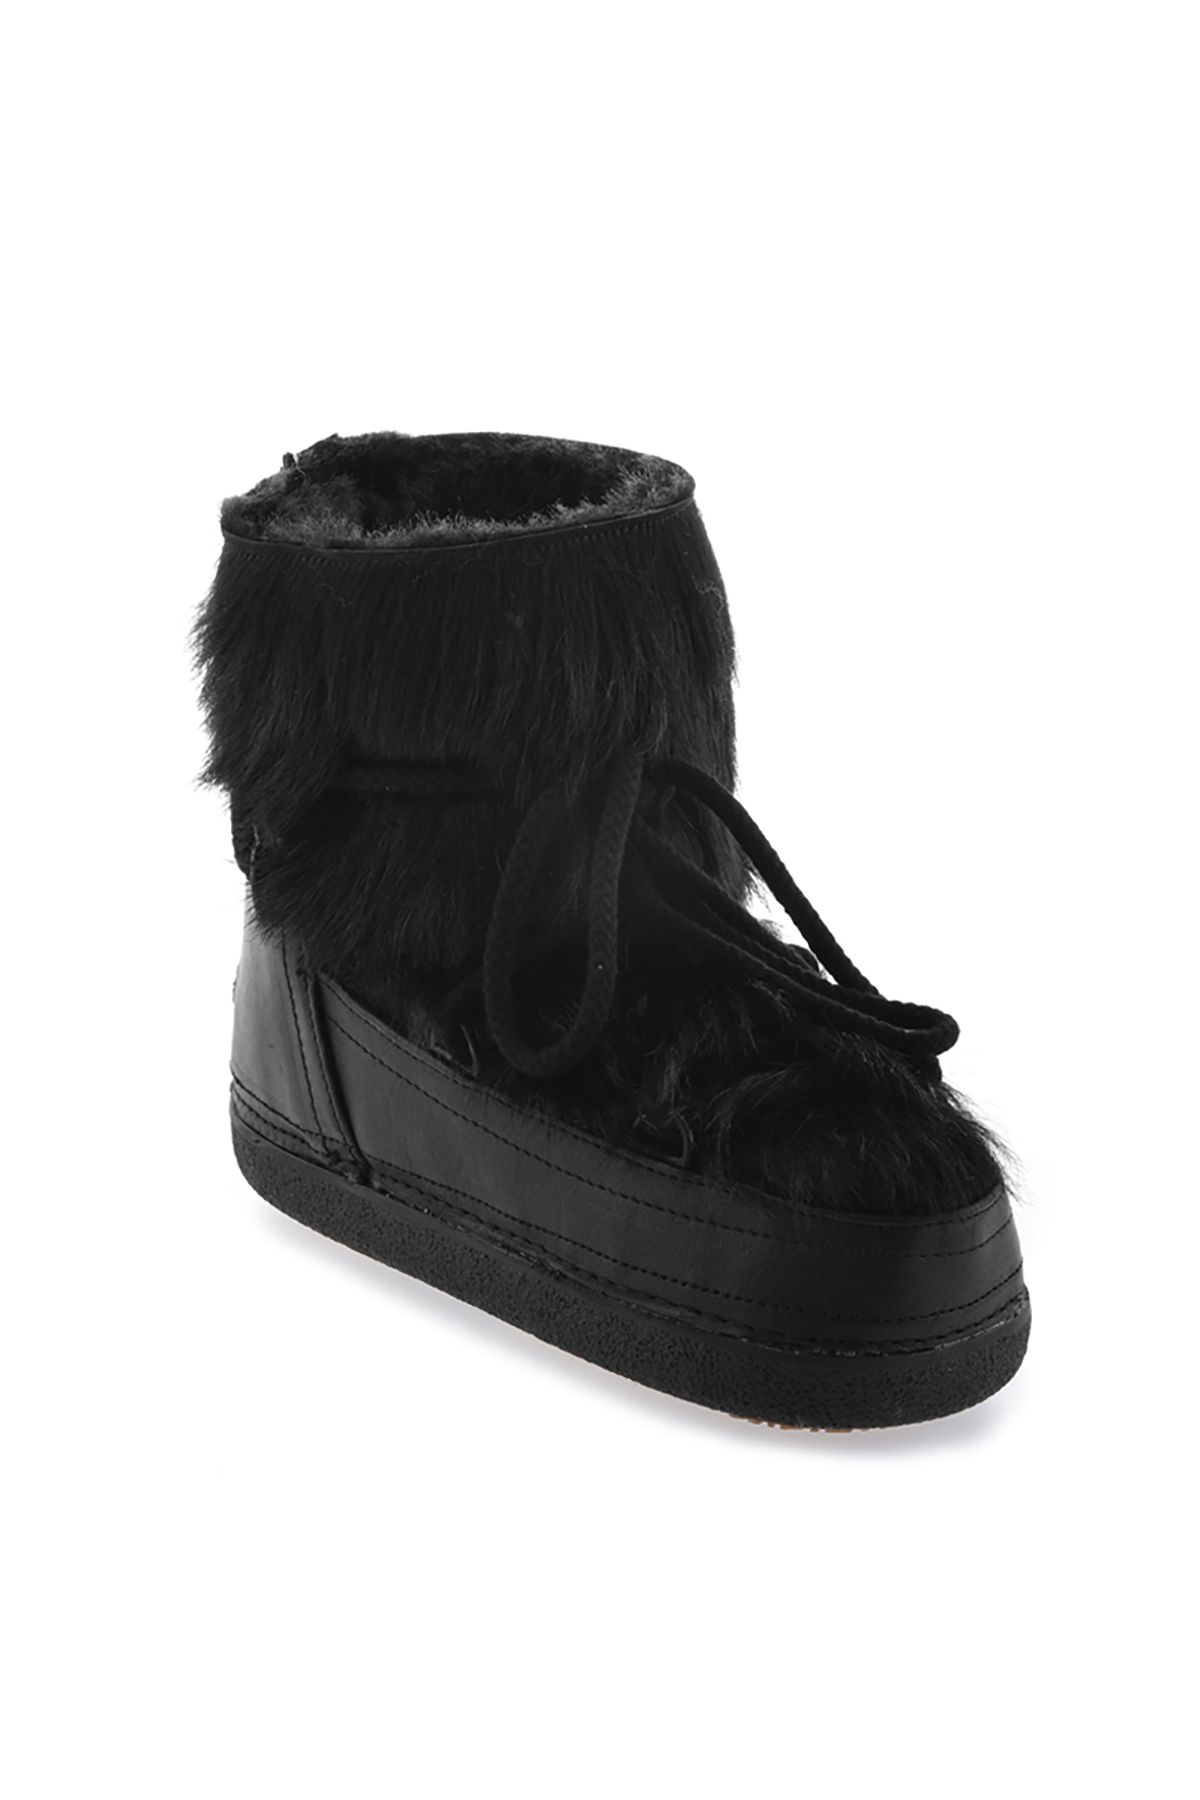 Cool Moon Women Snowboots From Genuine Fur Black